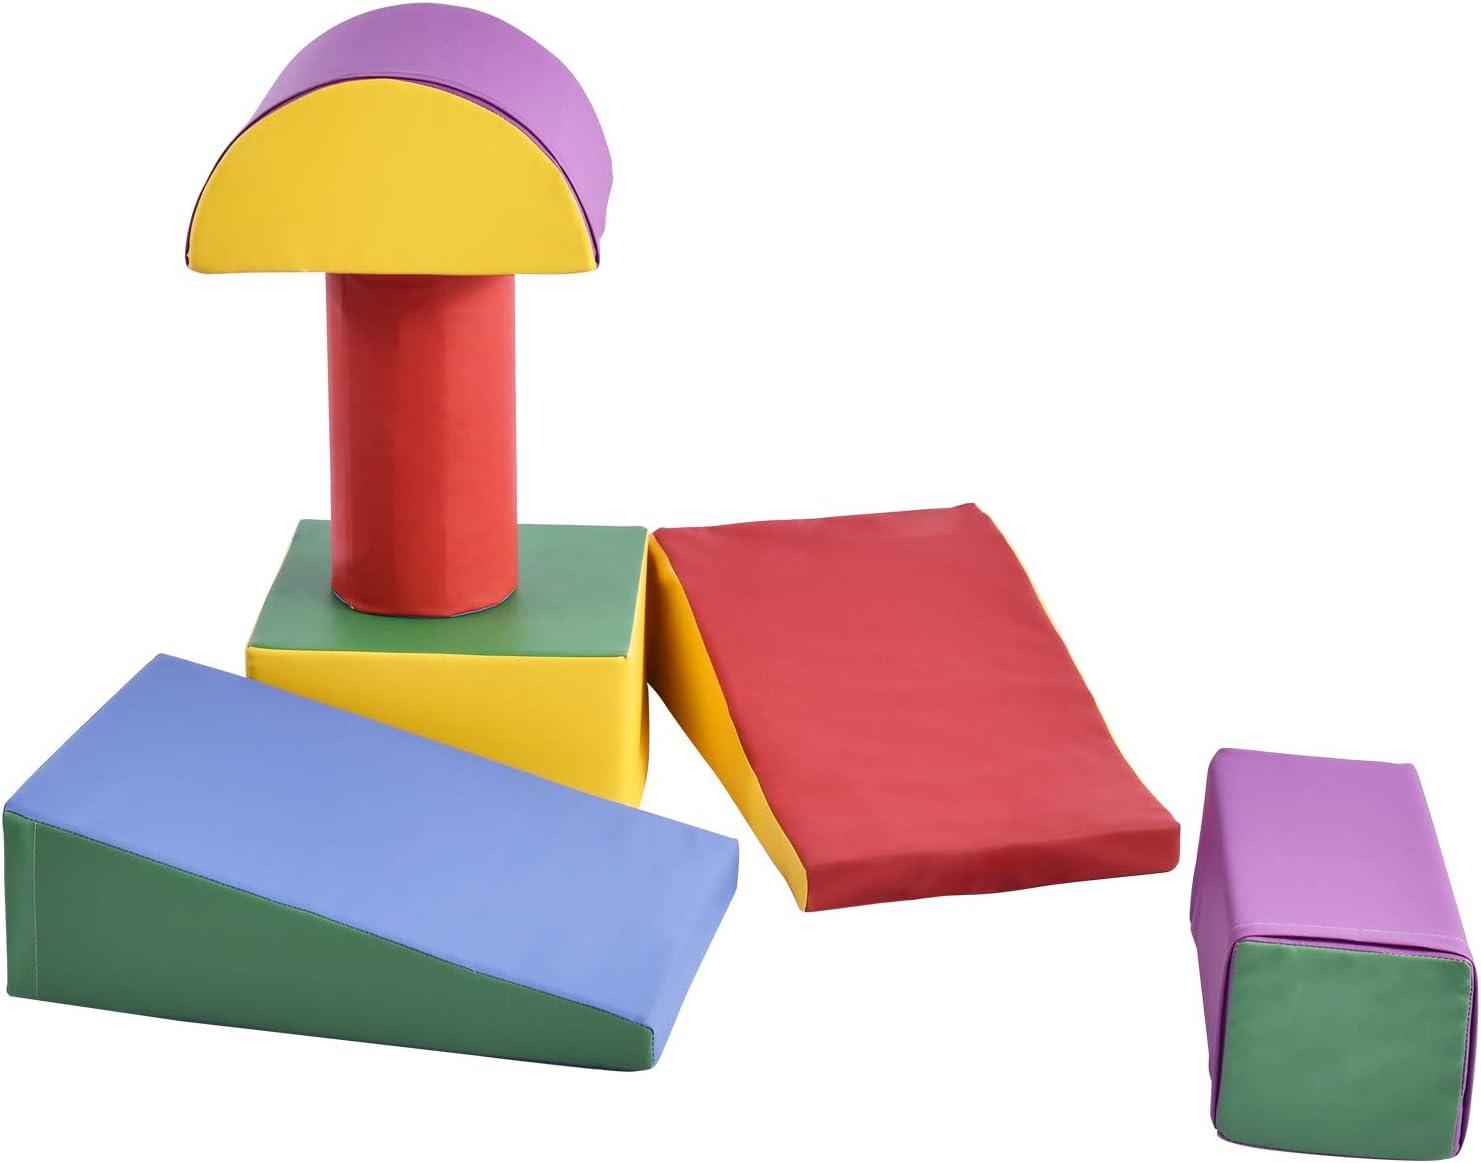 Motor Skills Color Coordination Ai CAR FUN 6 Pieces Foam Play Set Climb and Crawl Activity Play Set Lightweight Safe Interactive Set for Child Development